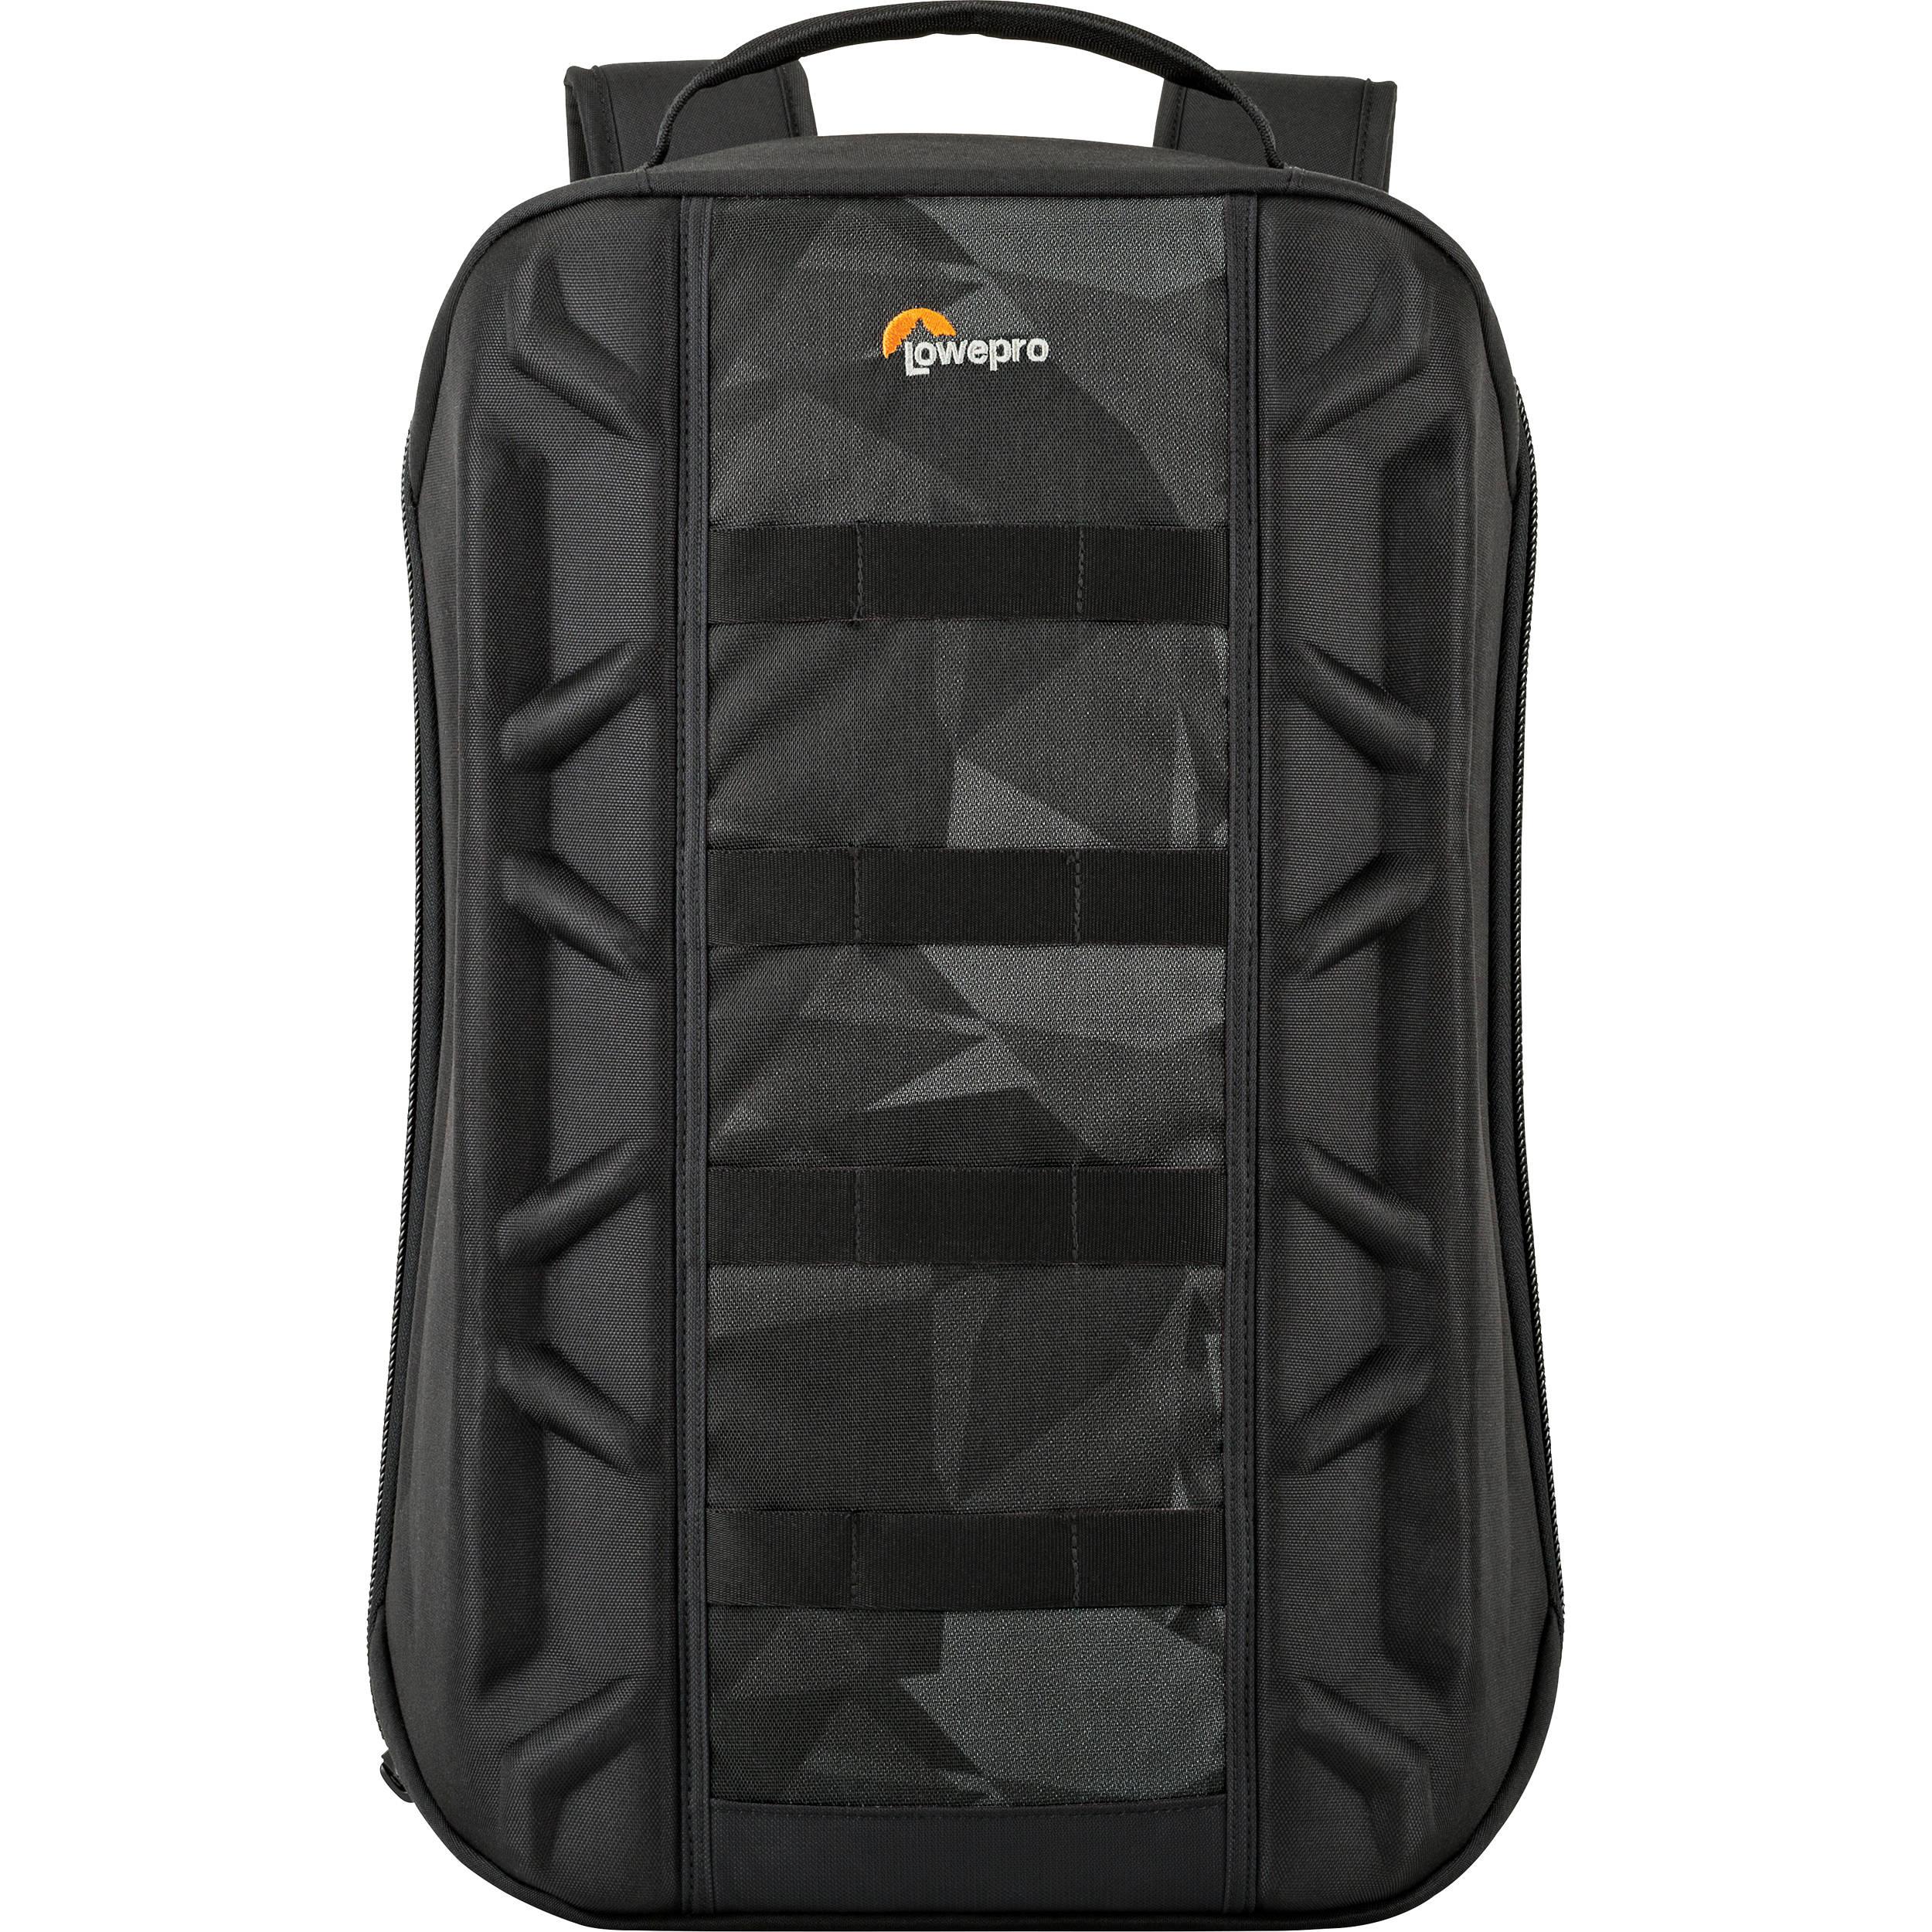 ca9873da62 Lowepro DroneGuard BP 400 Backpack for DJI Phantom-Series Quadcopter